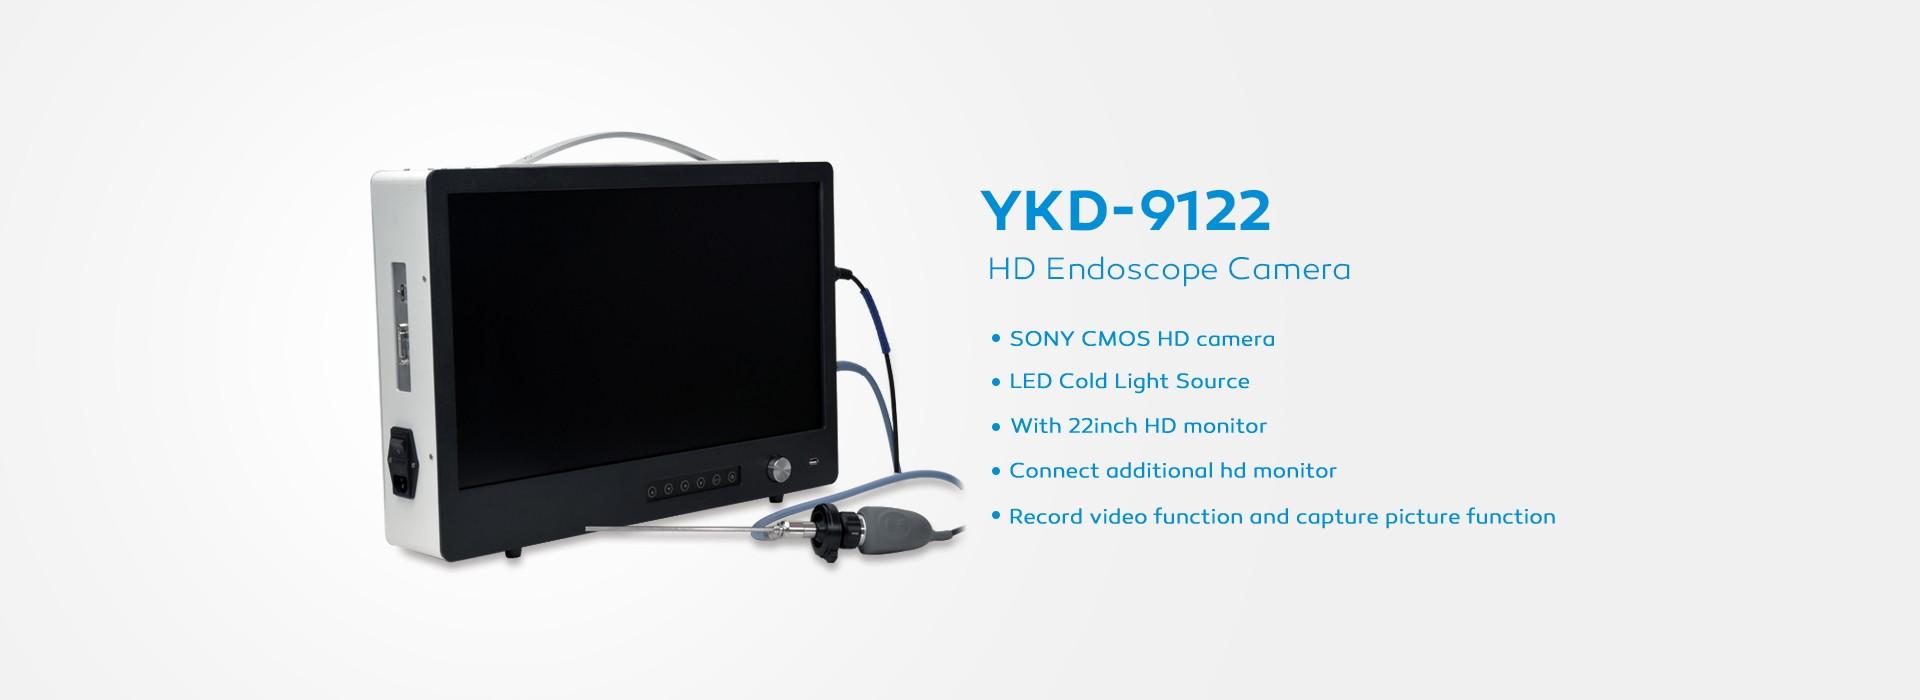 Full HD Endoscope Camera